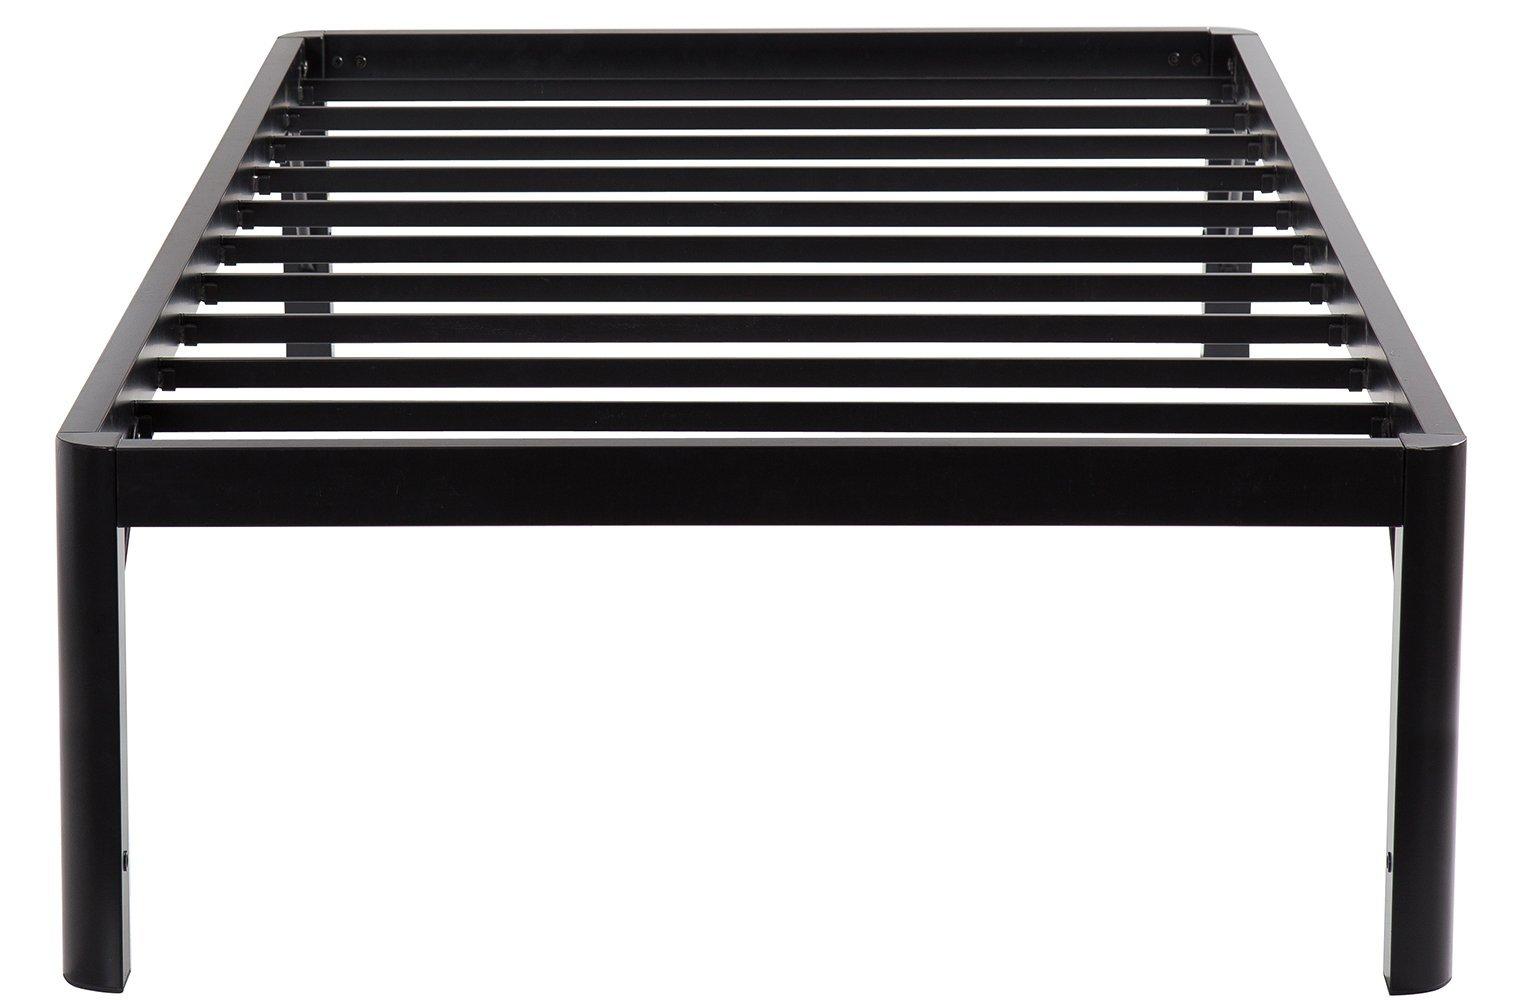 Olee Sleep 18inch Tall Round Edge Steel Slat / Non-slip Support High Profile Platform Bed Frame, Twin